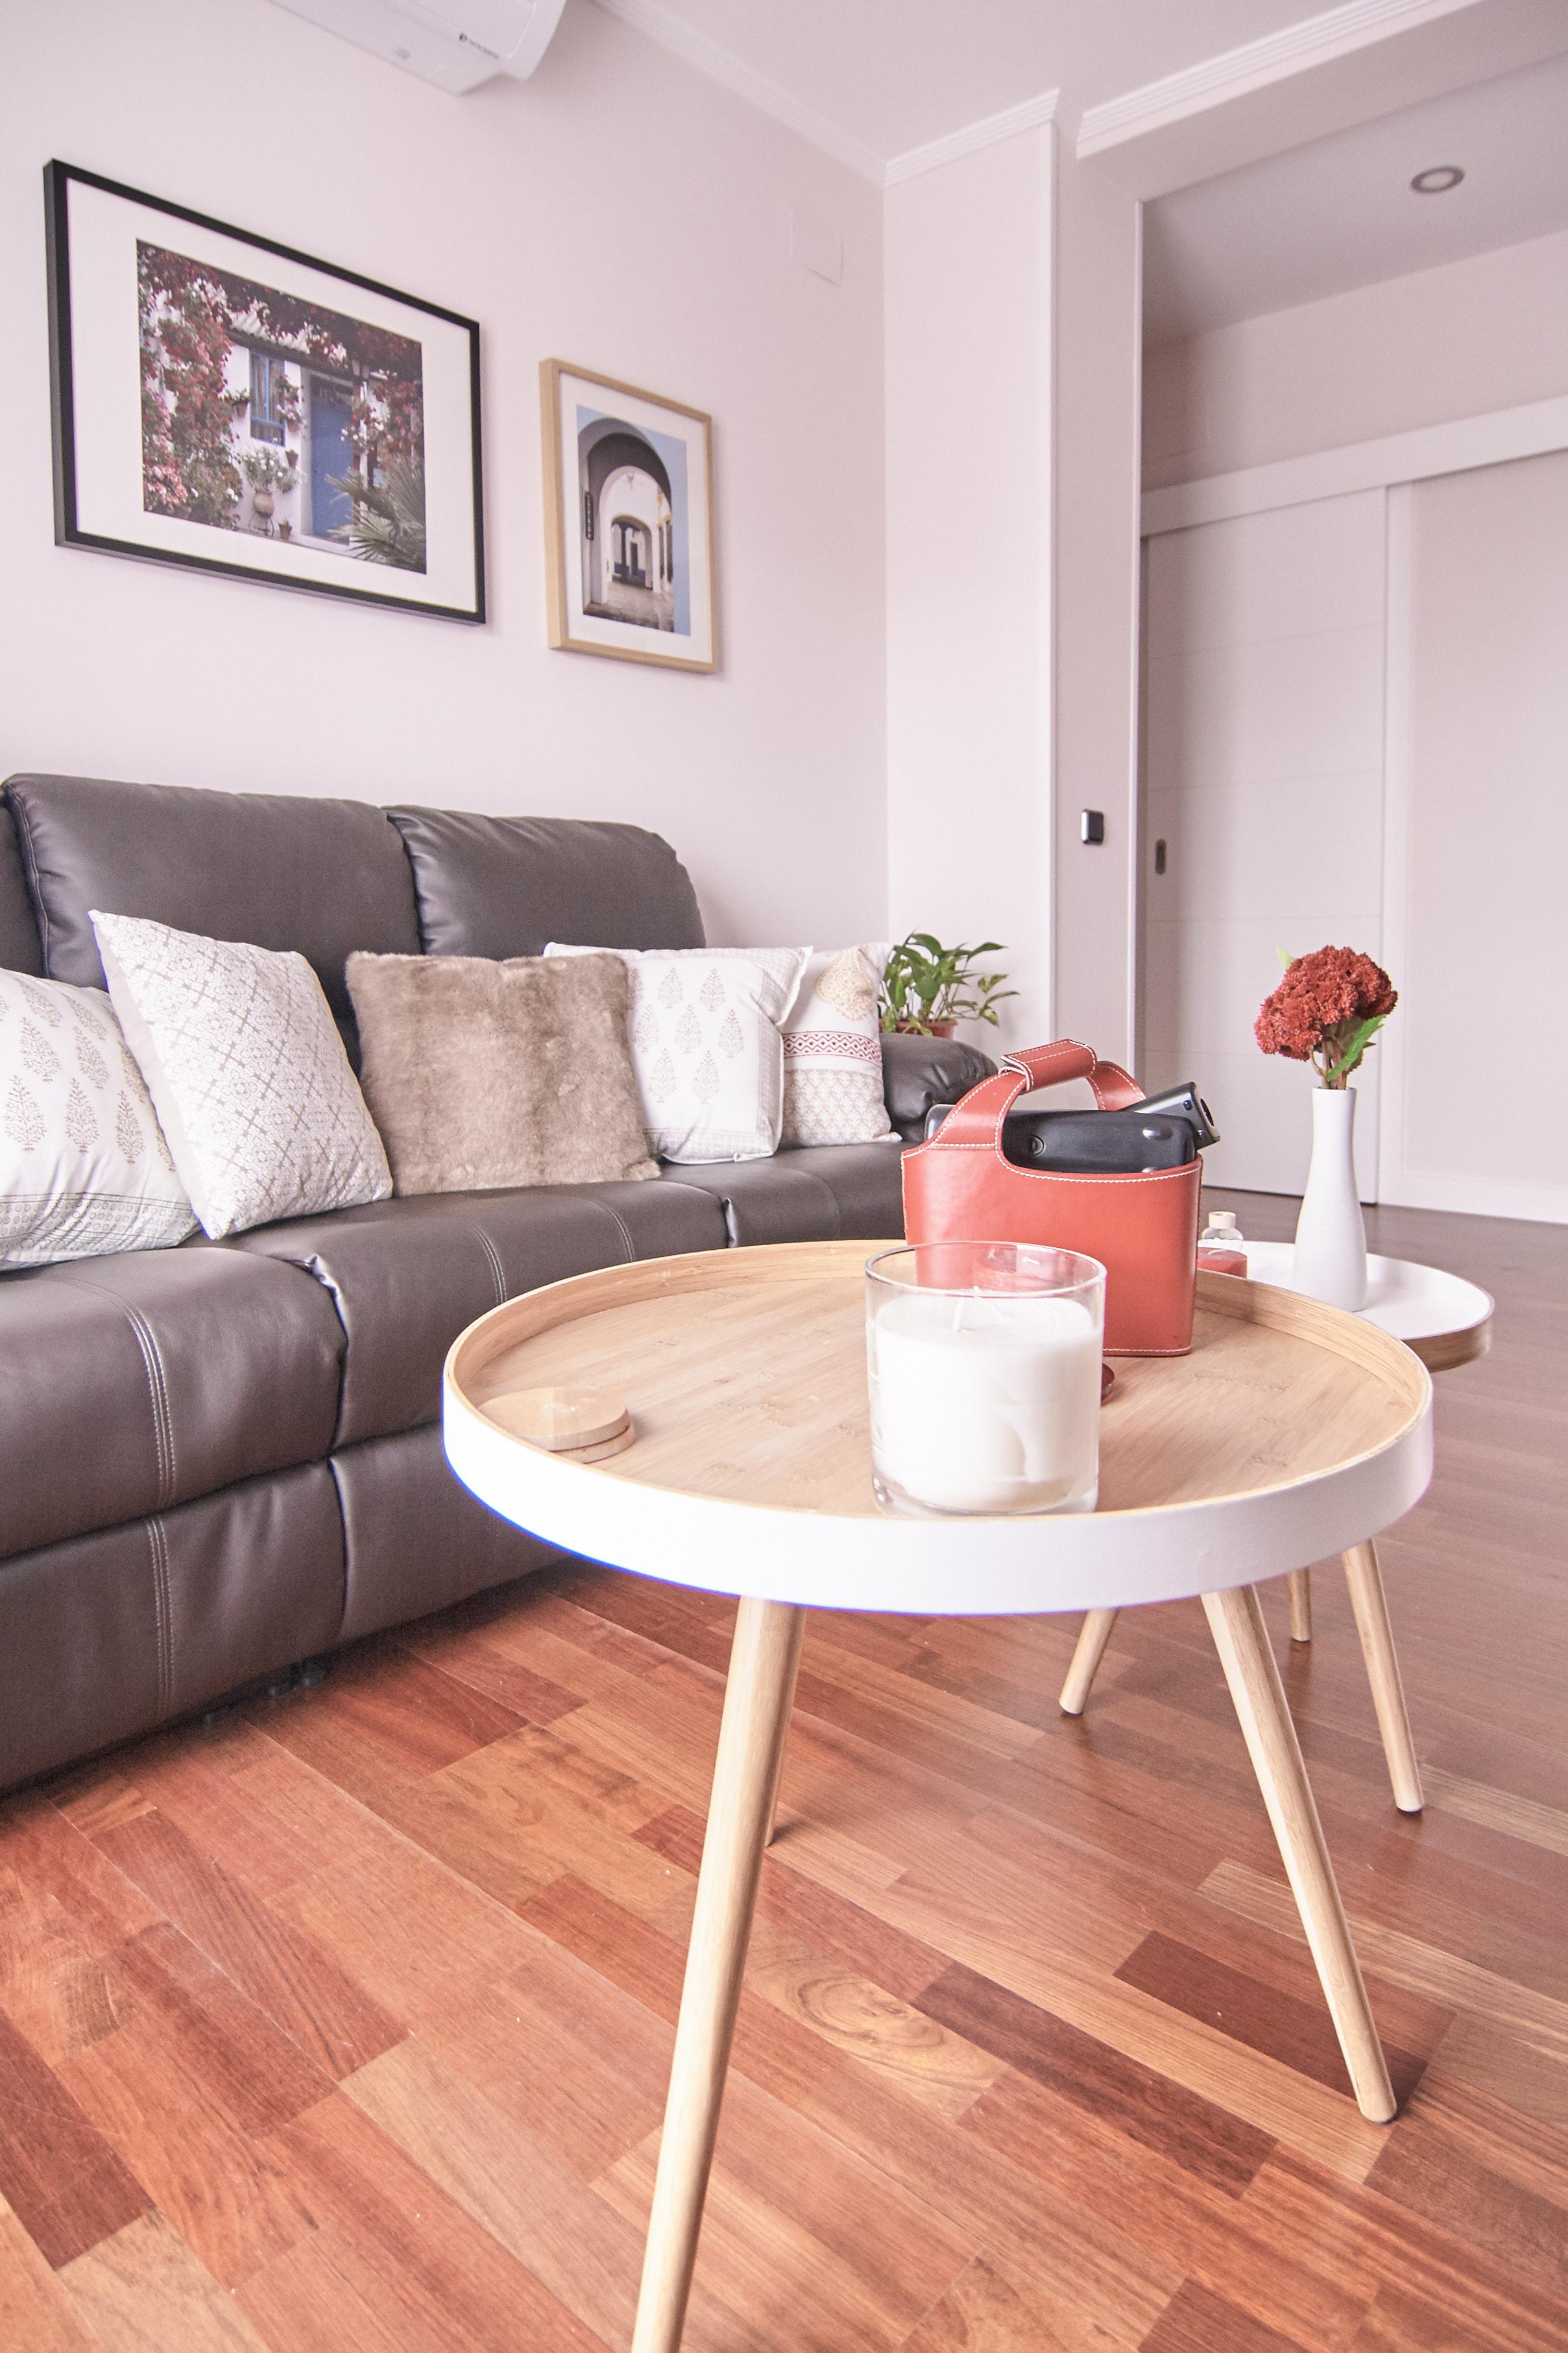 emmme studio amueblamiento decoracion Inma salon sofa mesas auxiliares.jpg